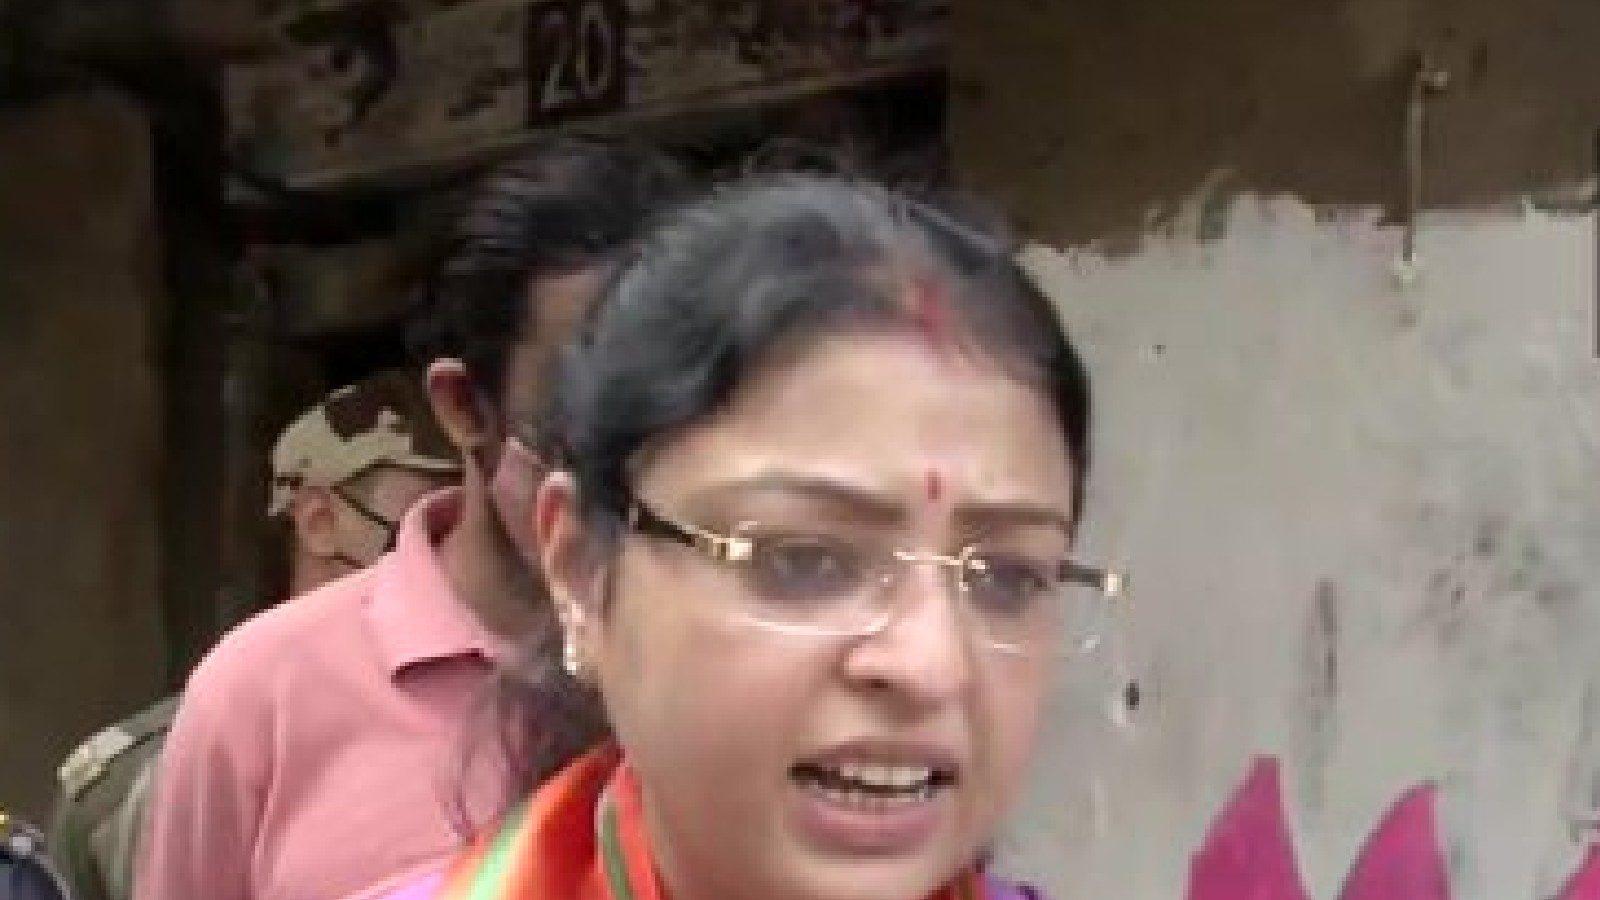 भवानीपुर उपचुनाव: भाजपा उम्मीदवार प्रियंका टिबरेवाल ने नामांकन दाखिल किया